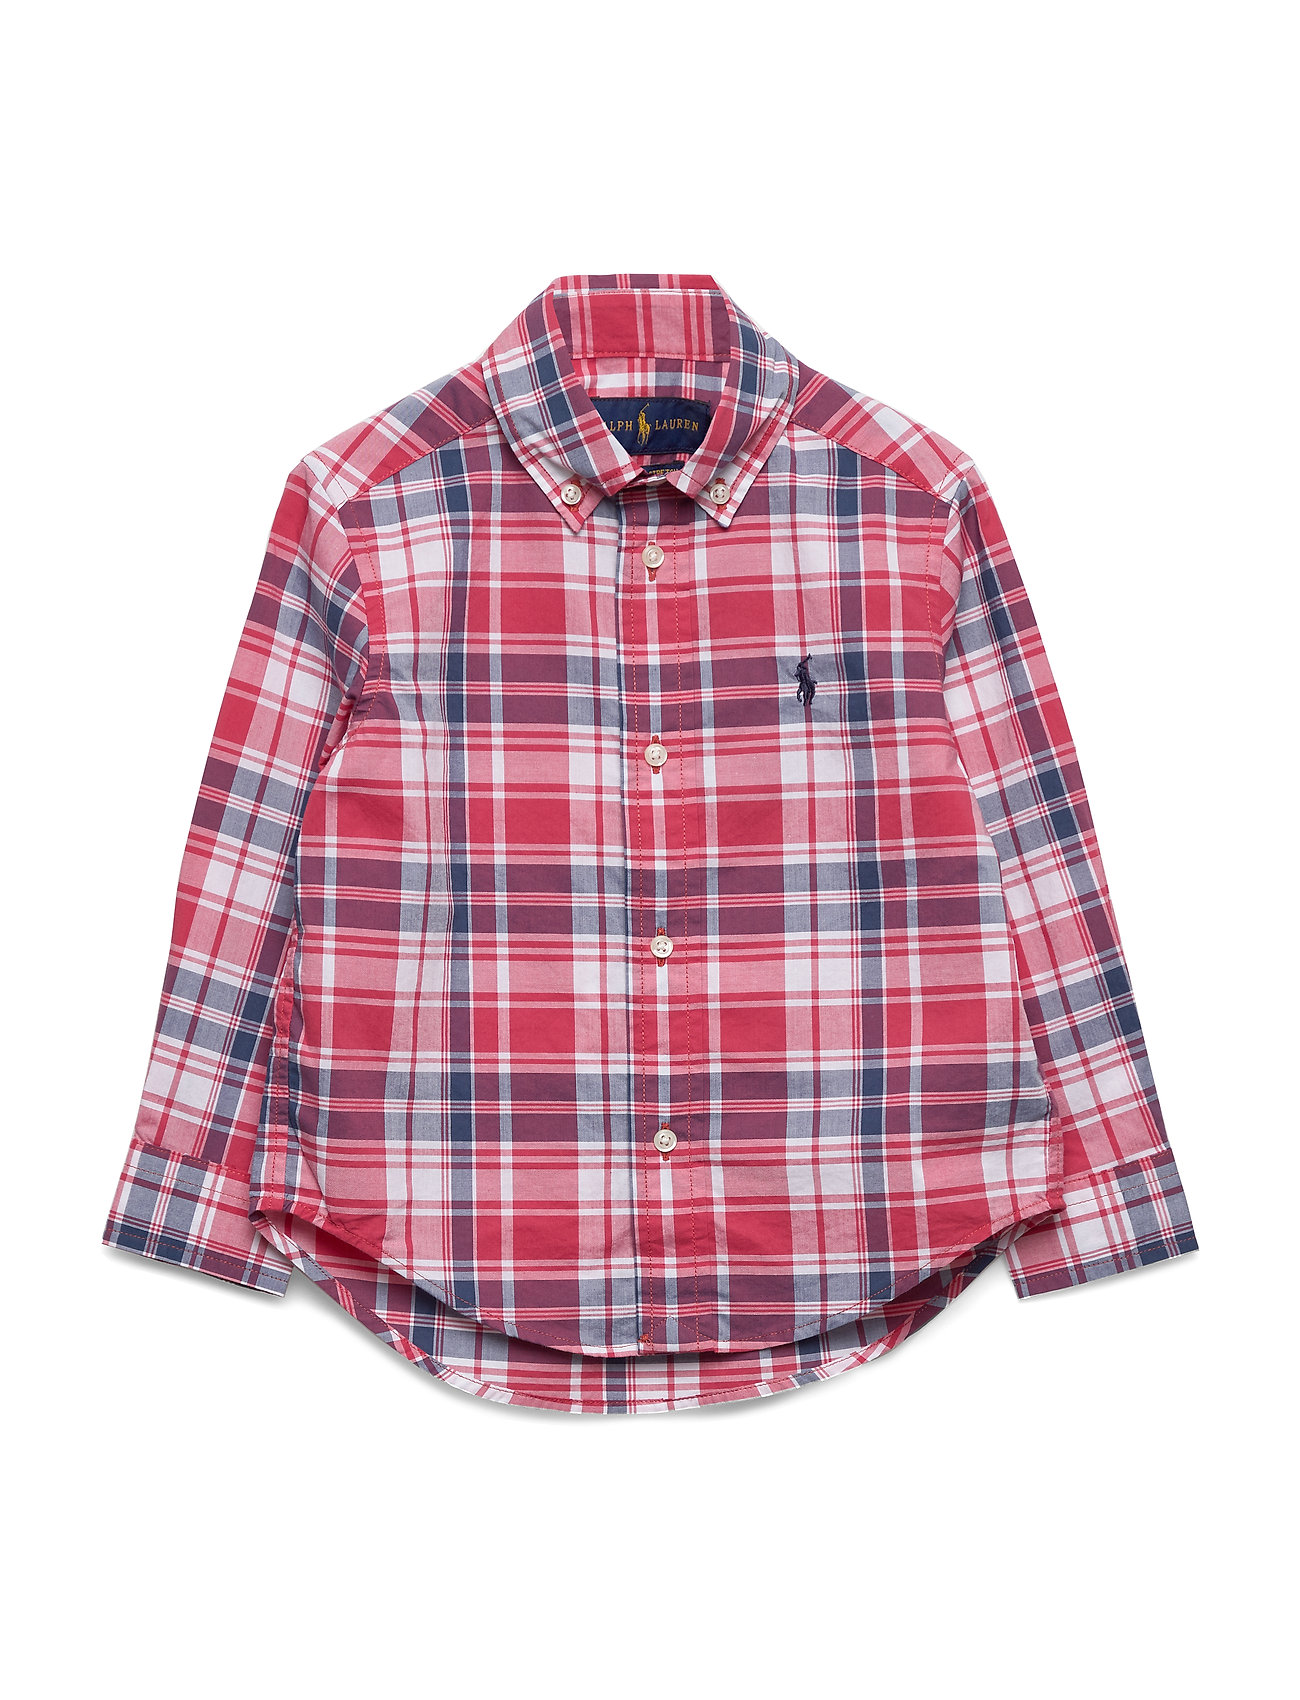 Ralph Lauren Kids Plaid Cotton Poplin Shirt - RED/WHITE